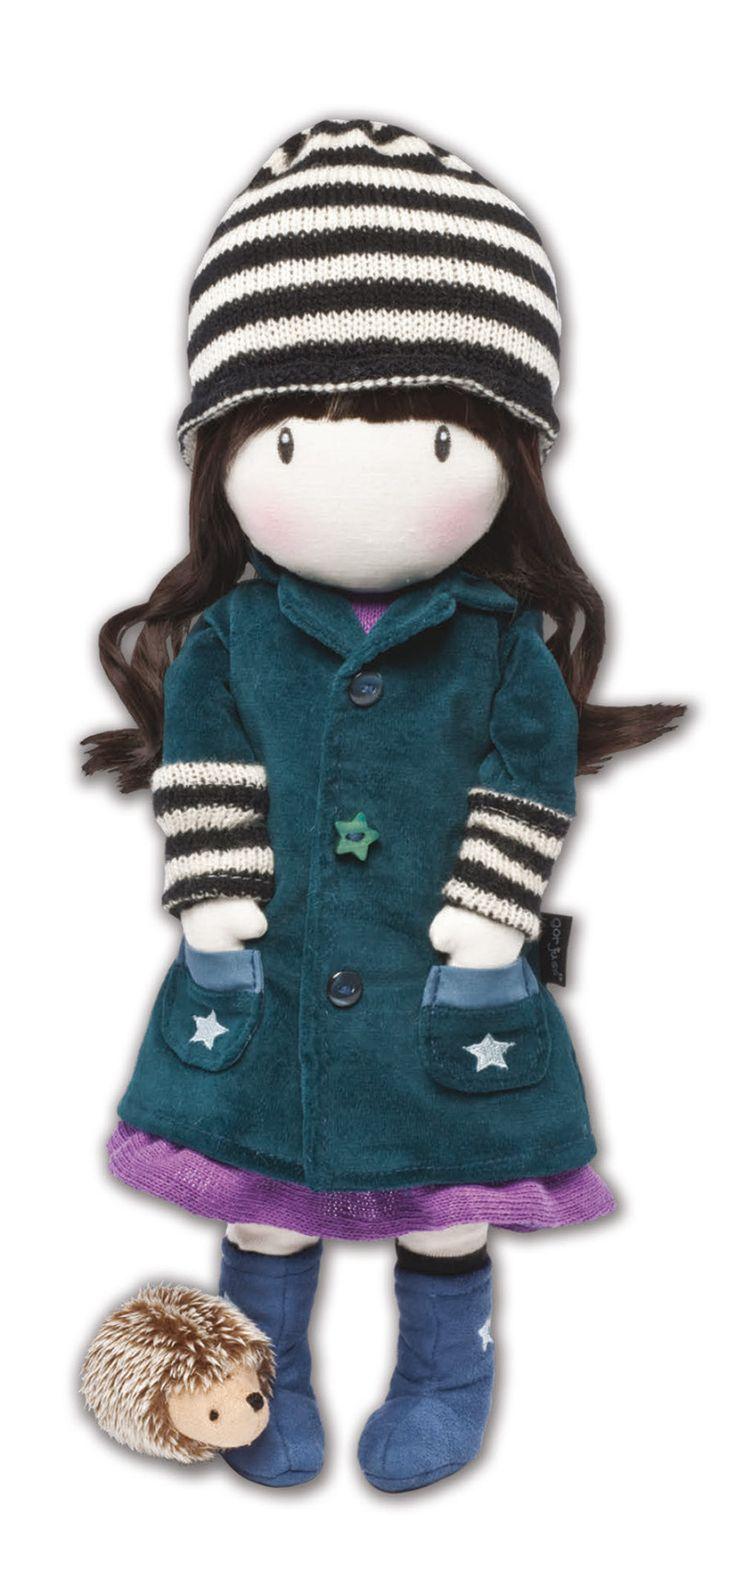 http://www.babycity.co.uk/sysimages/origimages/aurora-santoro-gorjuss-toadstools-doll-standing_sp10498_1.jpg - Santoro London dolls